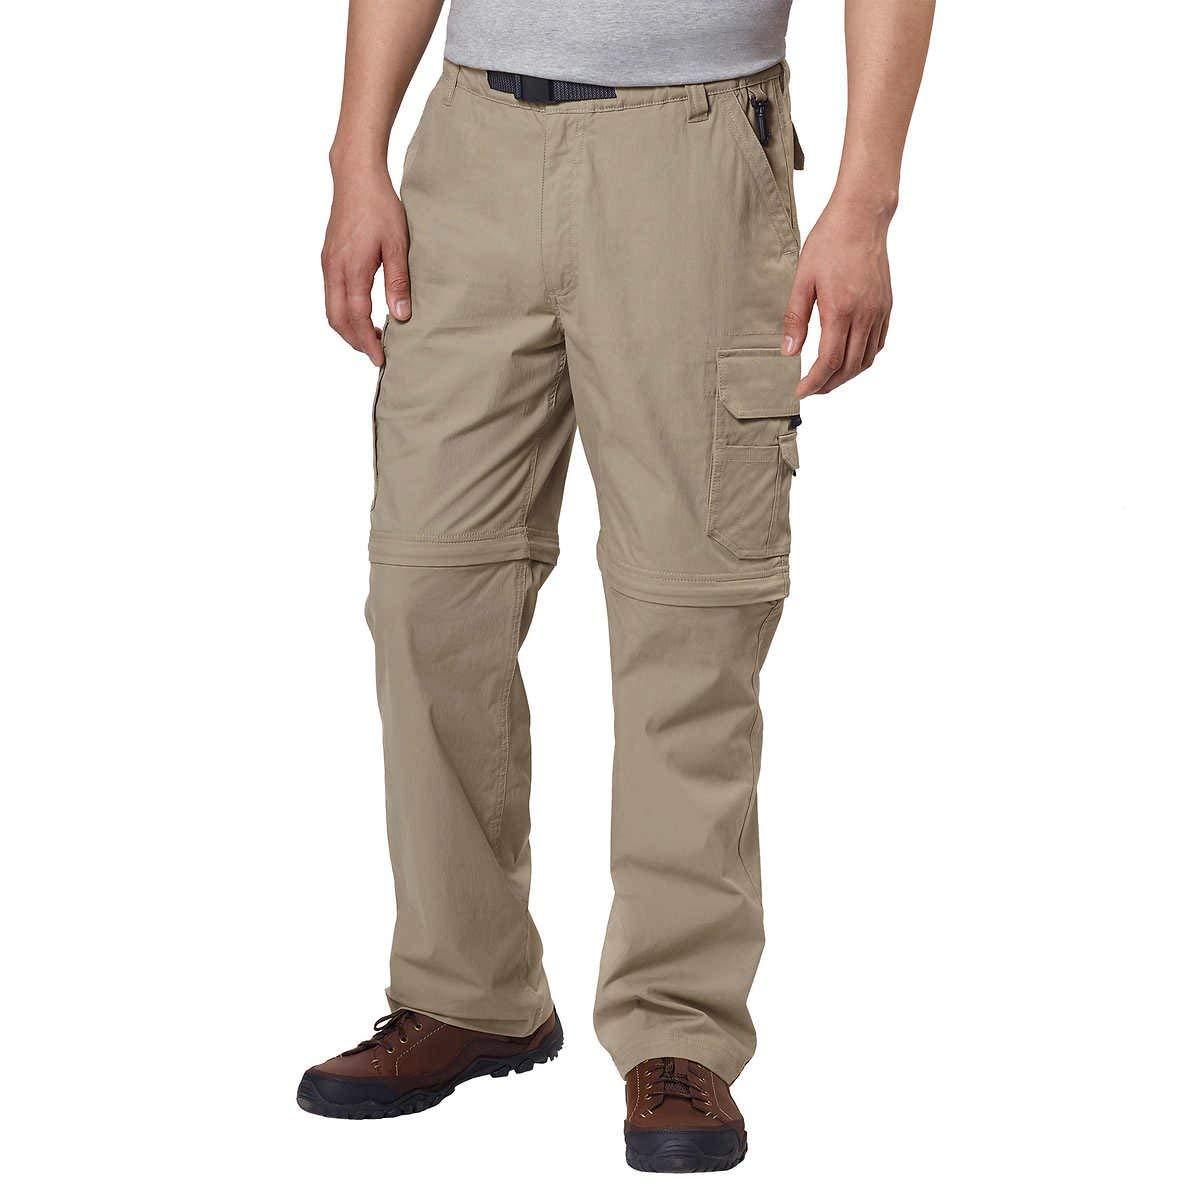 BC Clothing Mens Convertible Lightweight Comfort Stretch Cargo Pants Or Shorts (XXLx34, Khaki)